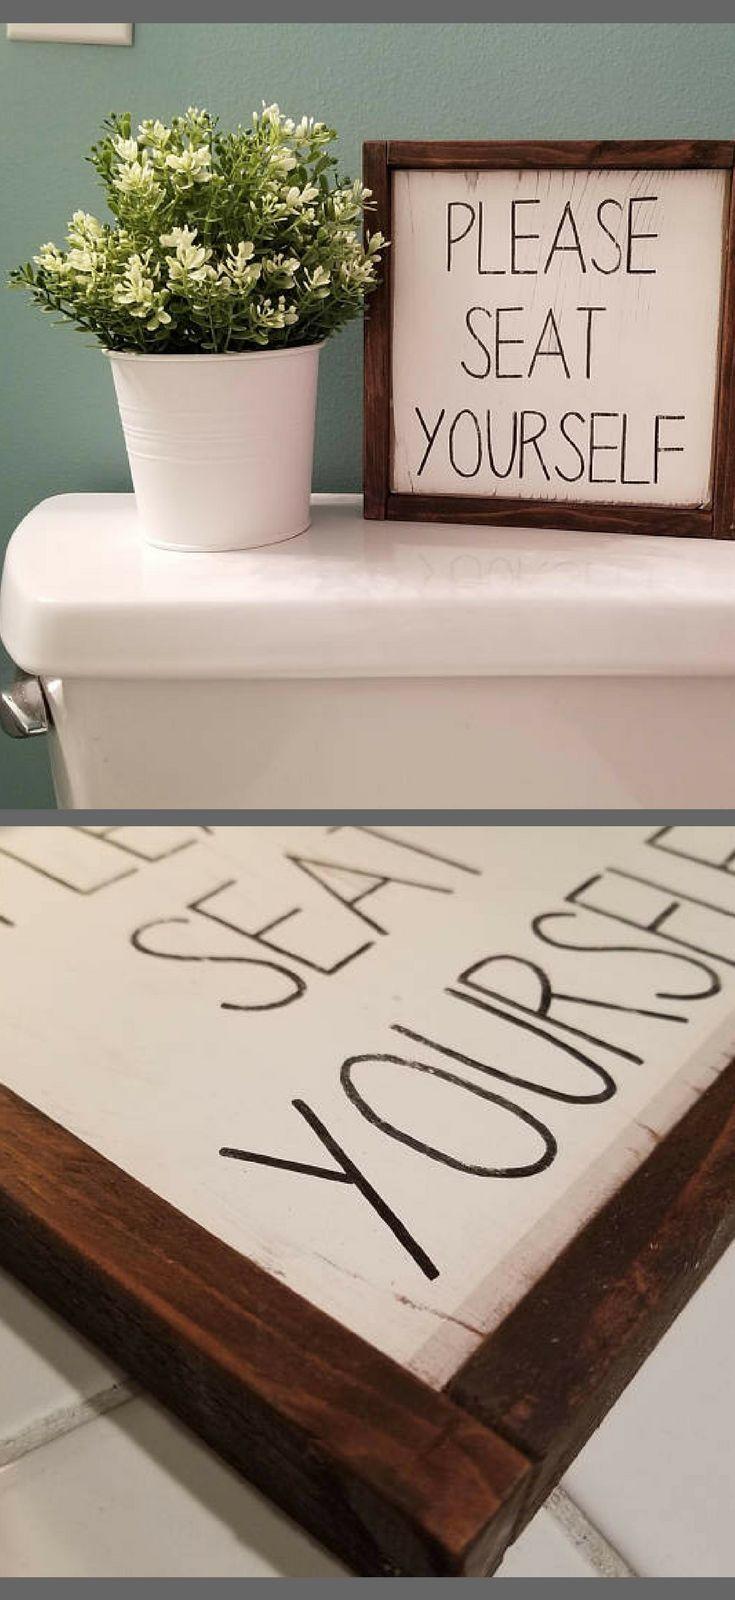 Subtle Bathroom Humor Please Seat Yourself Sign For Bathroom Farmhouse Sign Rustic Home Decor Rustic Farmhouse Bathroom Modern Farmhouse Decor